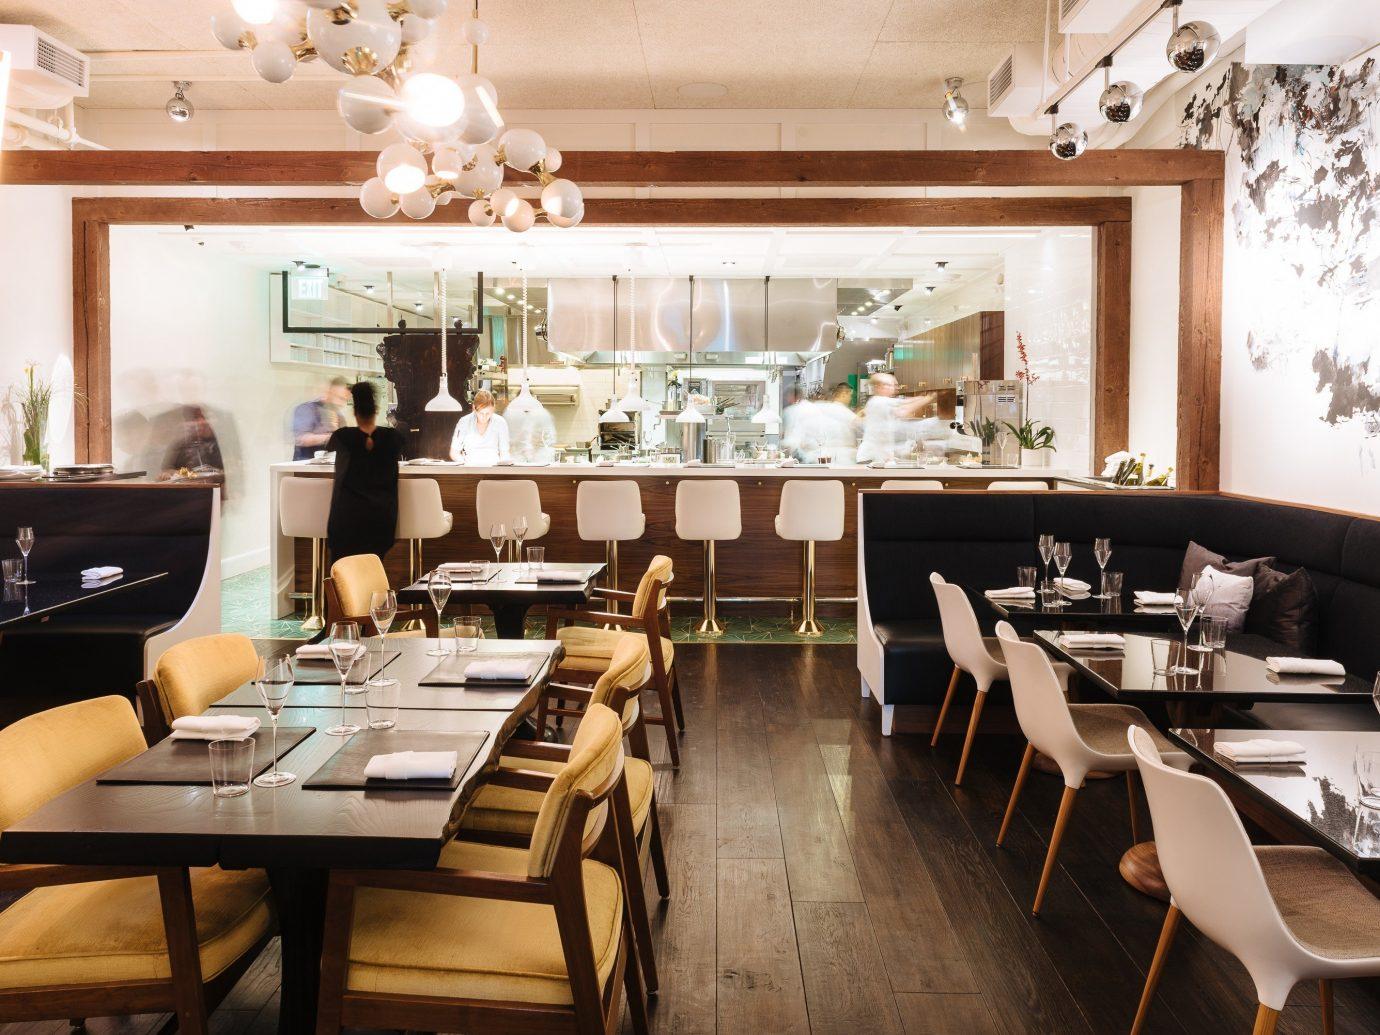 Food + Drink indoor floor table window room restaurant dining room ceiling meal interior design function hall brunch furniture Island dining table